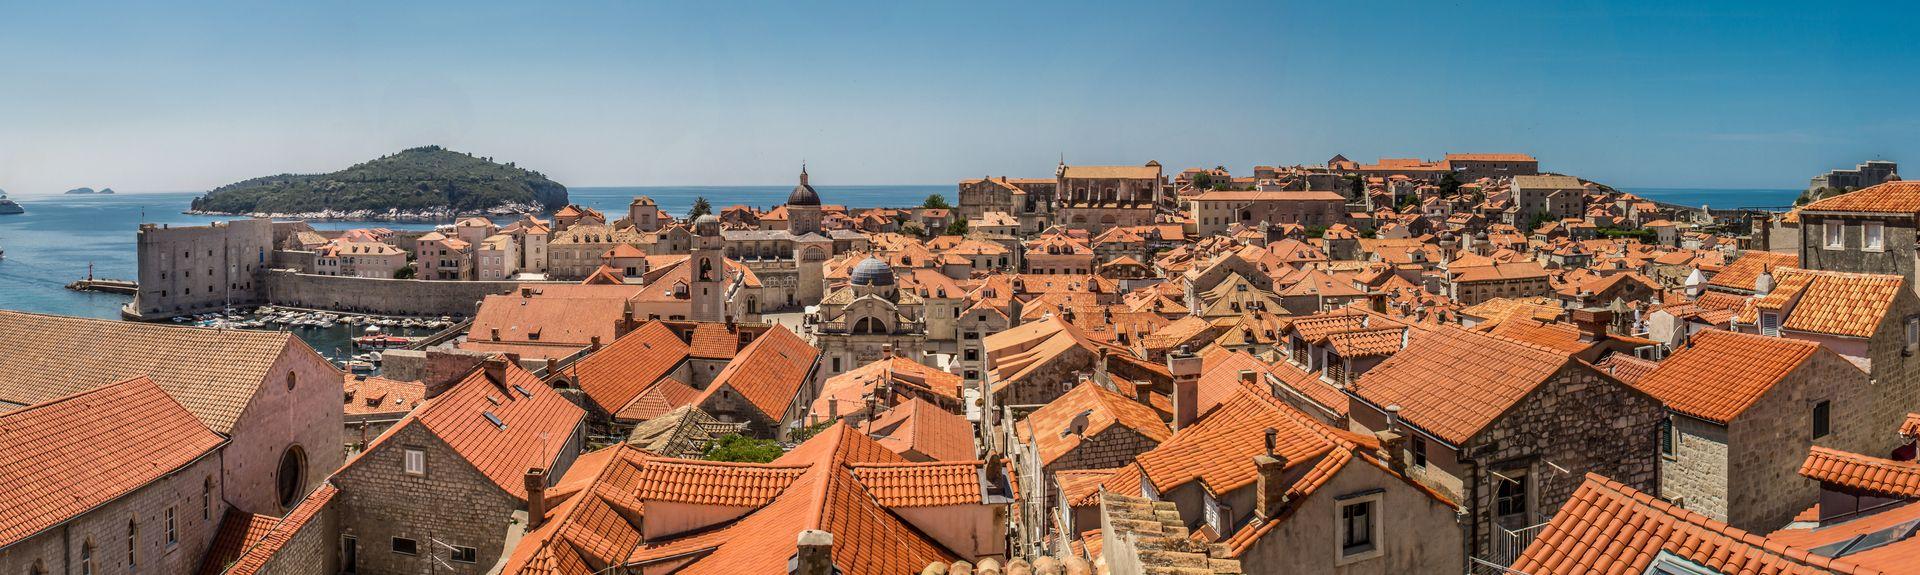 Dalmatien Festland, Gespanschaft Split-Dalmatien, Kroatien